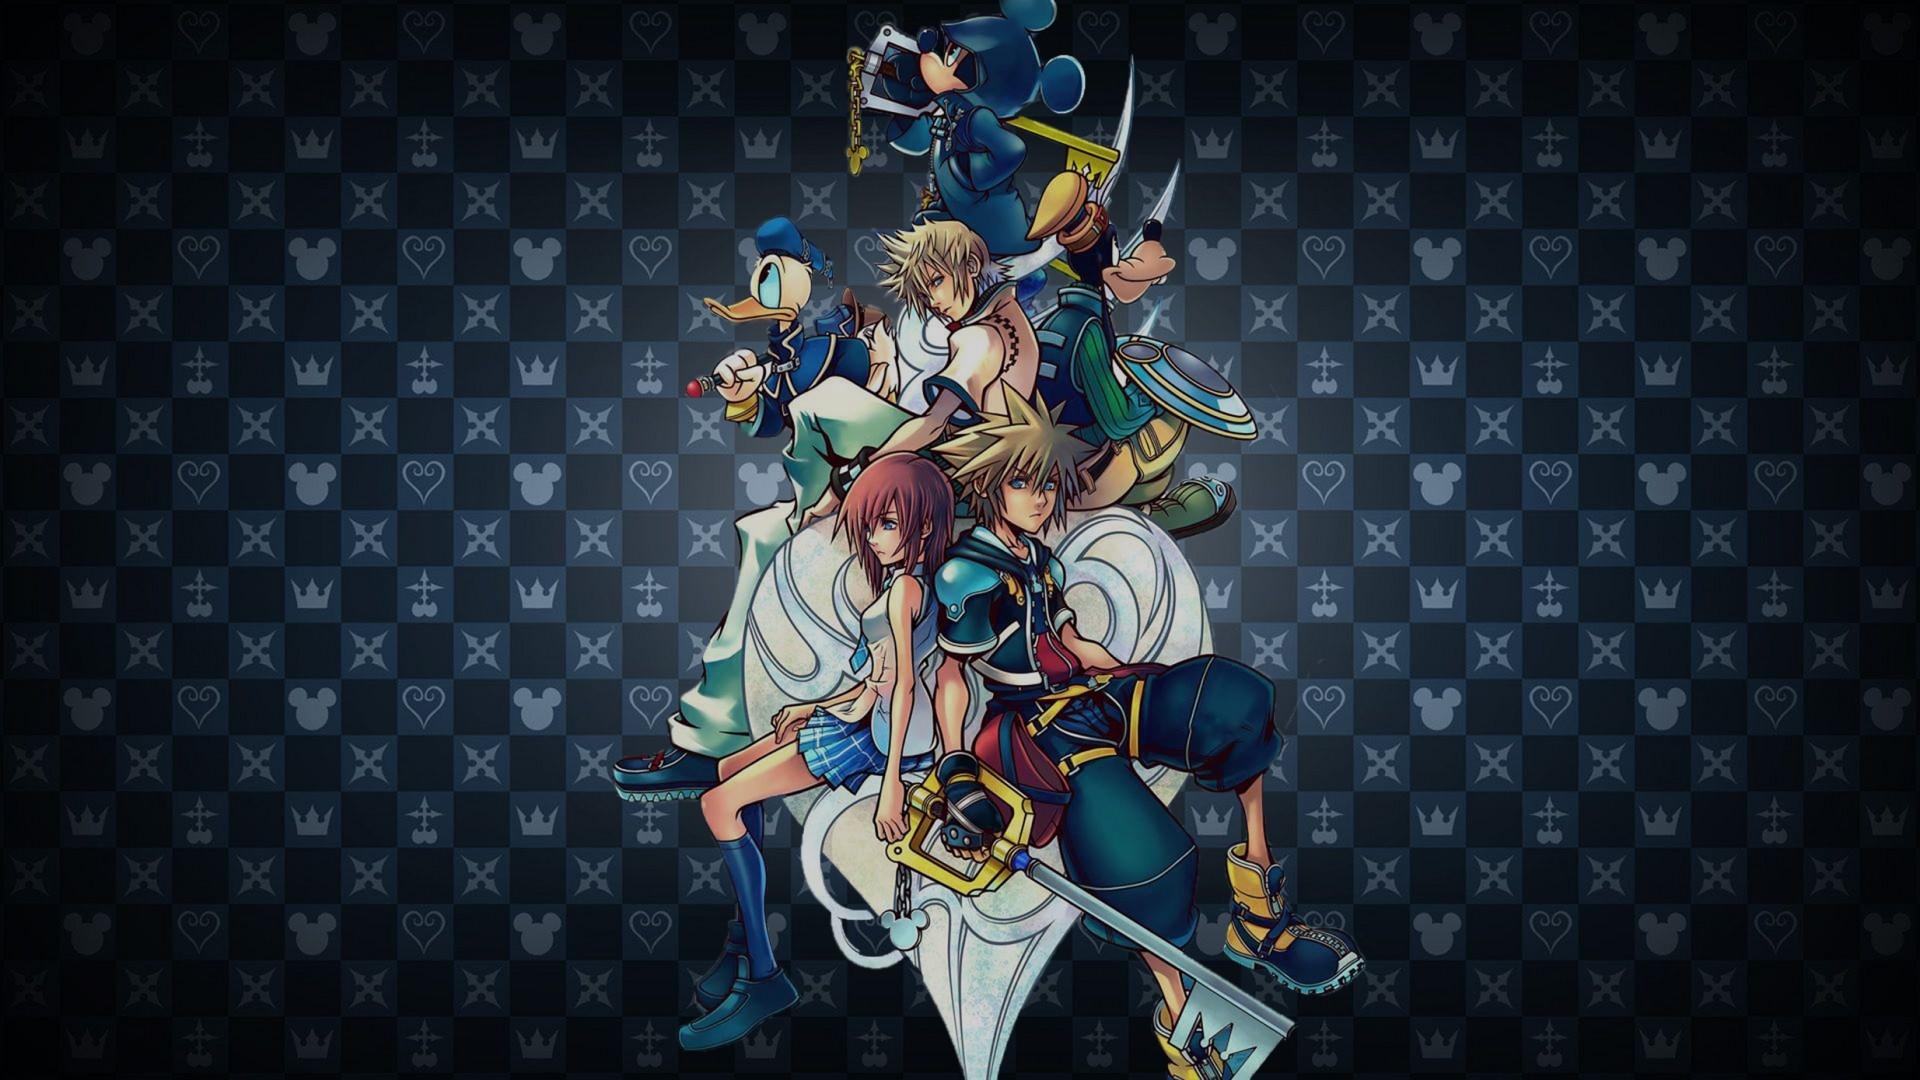 Kingdom Hearts 3 Wallpaper